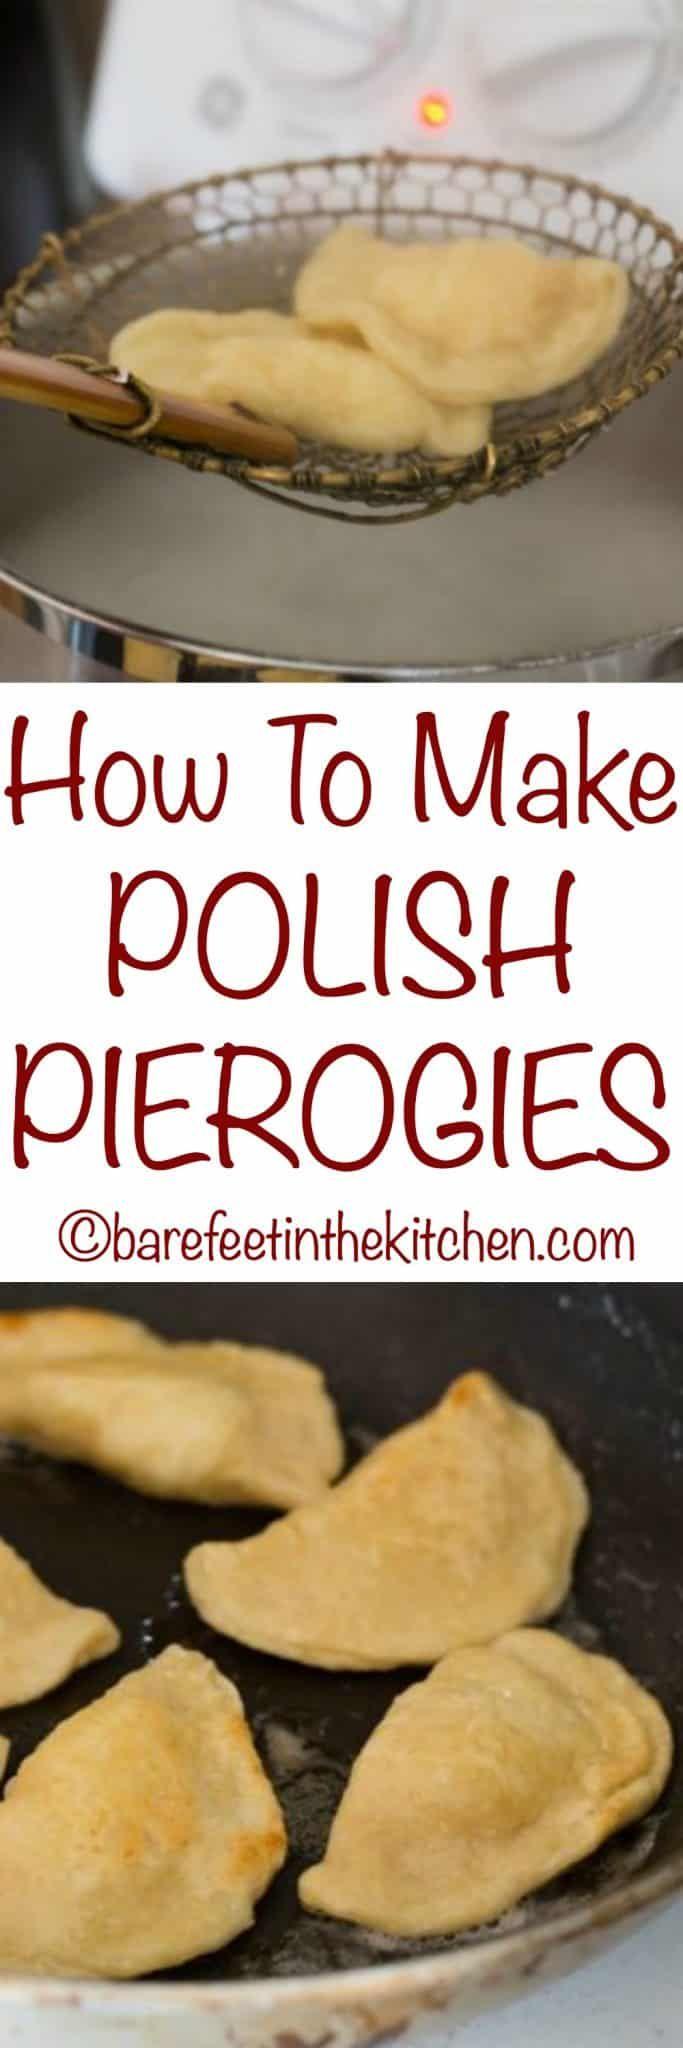 How To Make Polish Pierogies - get the recipe at barefeetinthekitchen.com